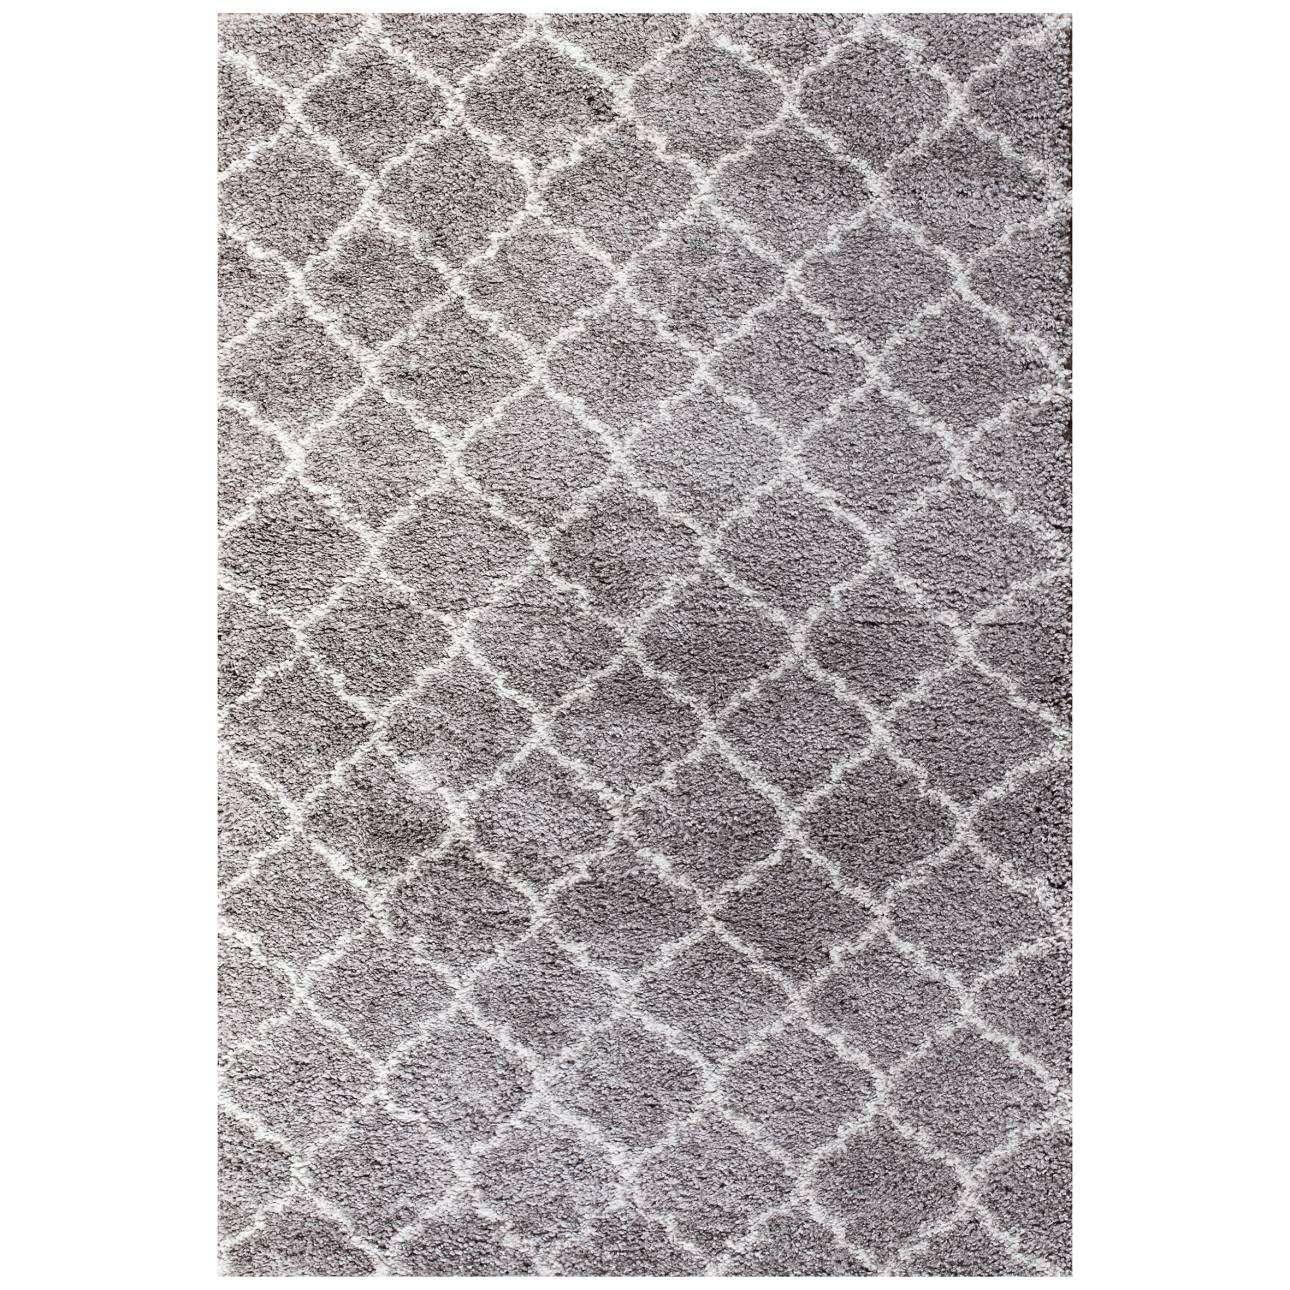 Dywan Royal Marocco light grey/cream 160x230cm 160x230cm